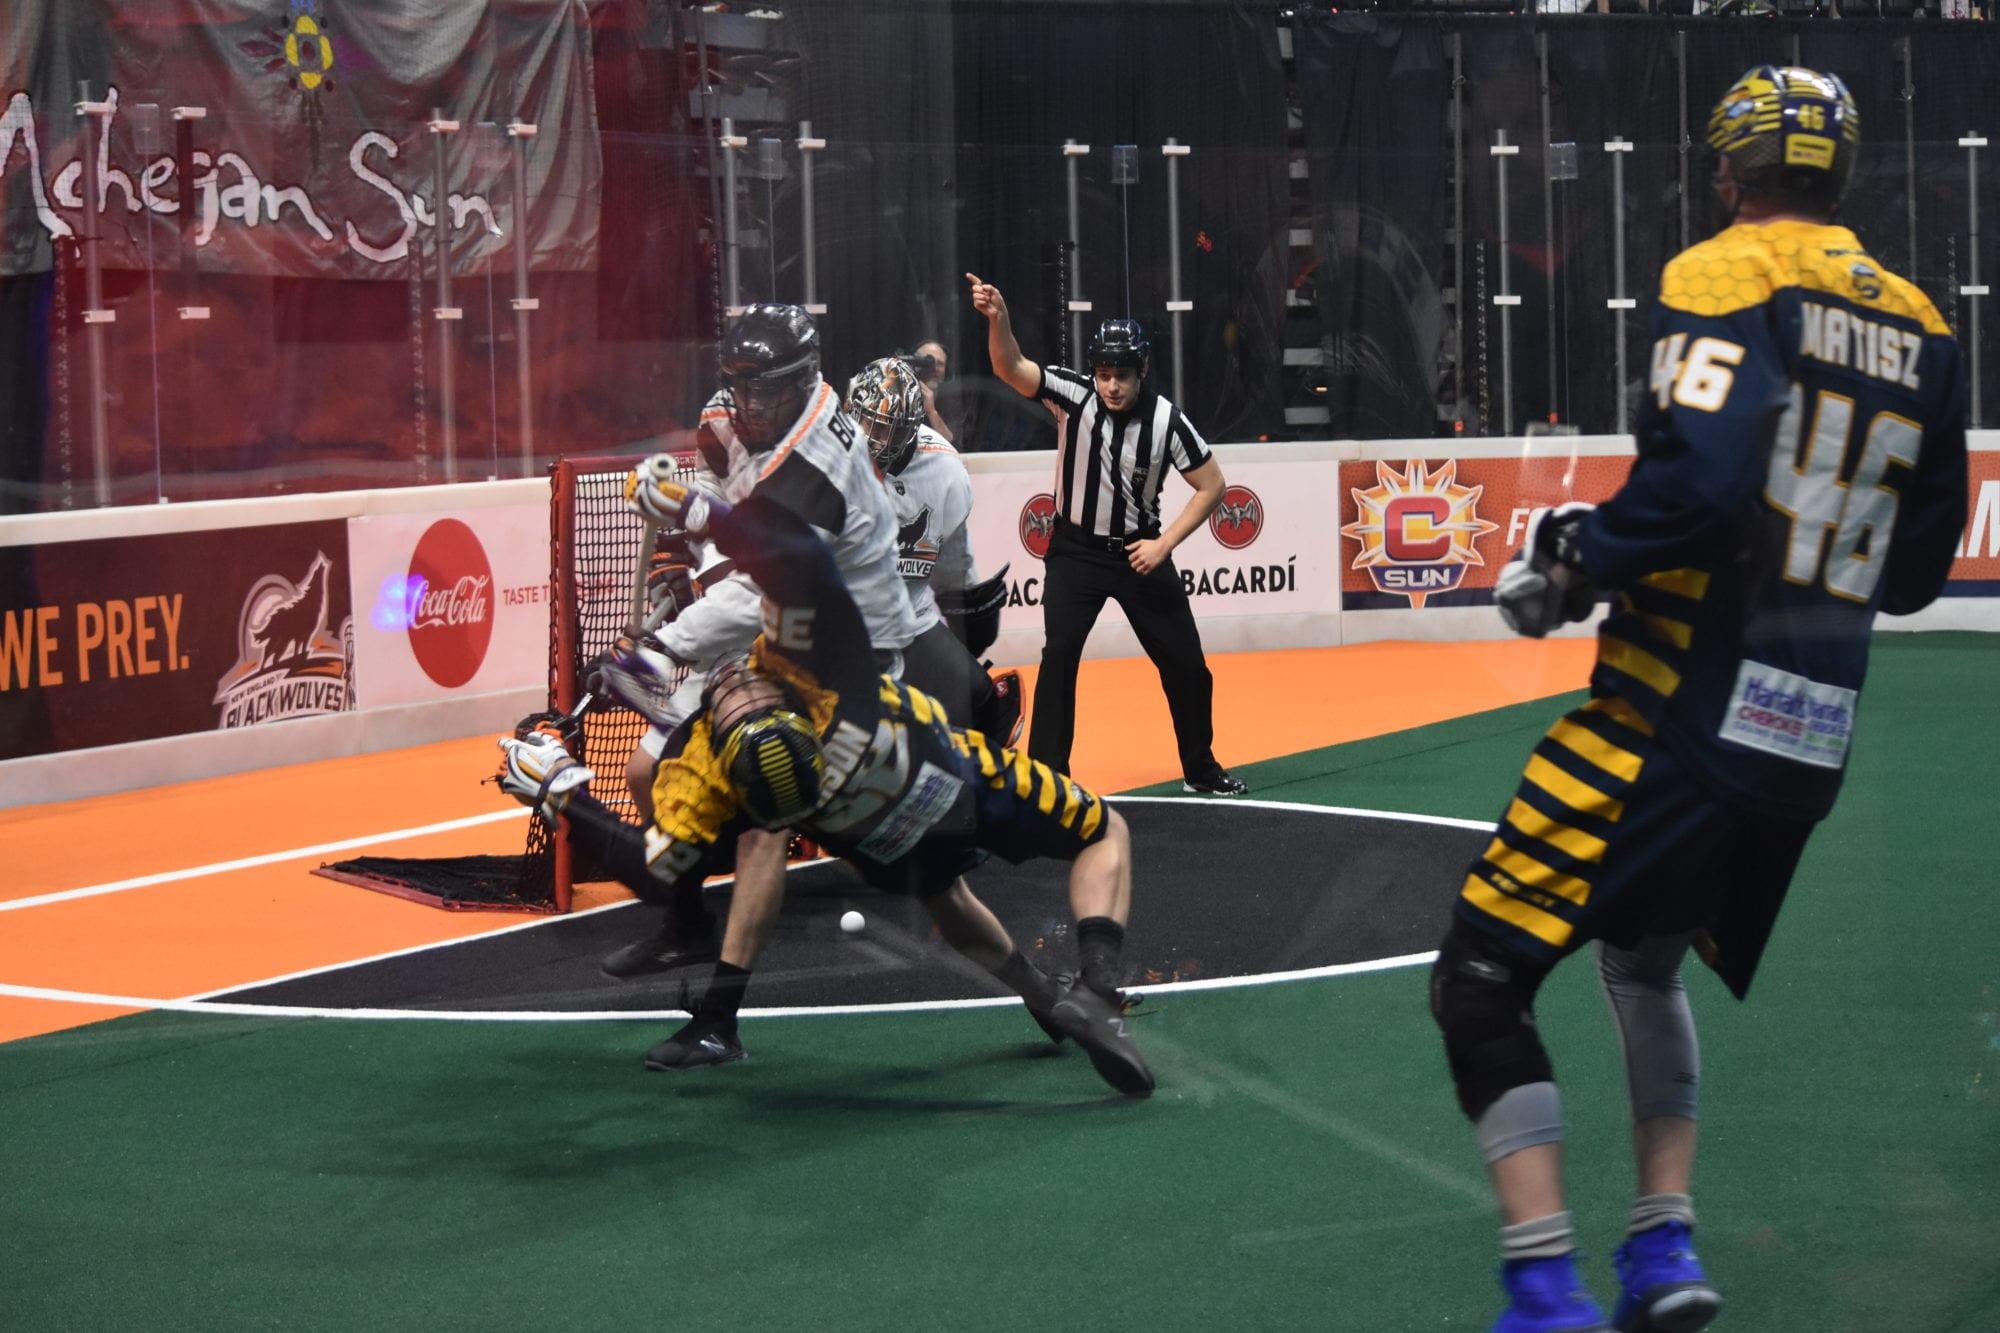 nll big hit lacrosse box